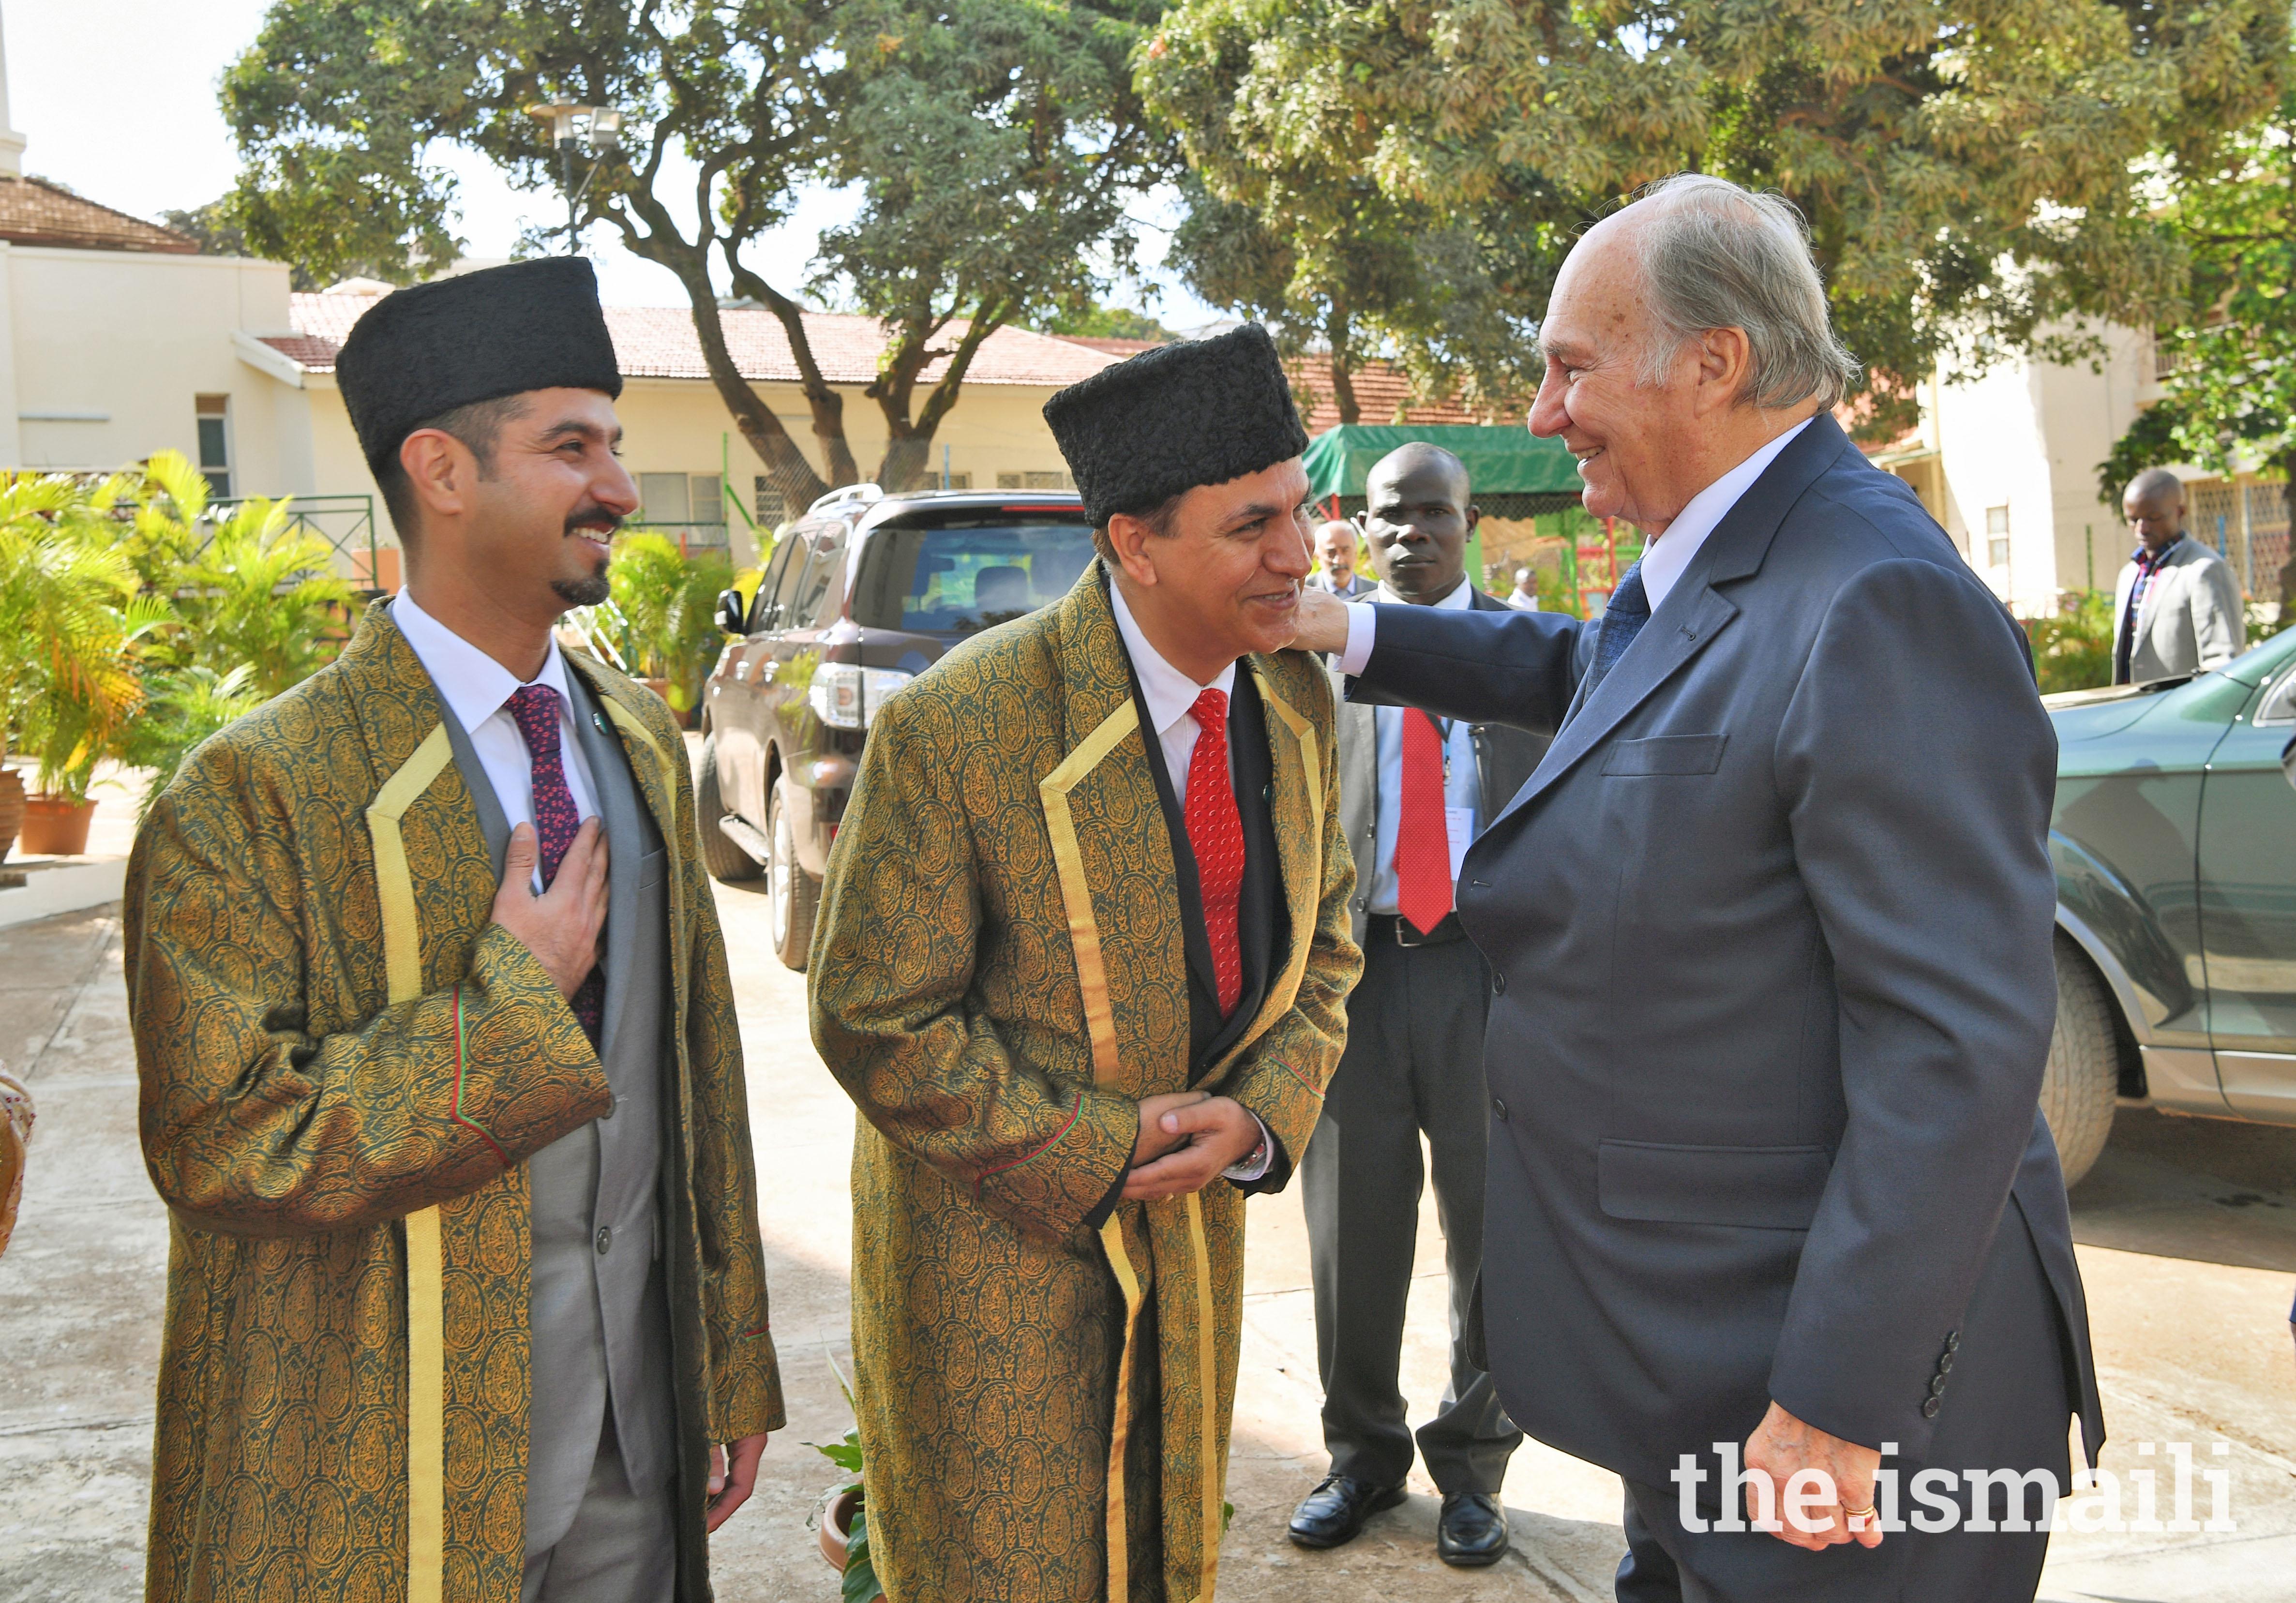 October 10, 2017: Historic occasion of Diamond Jubilee visit to Uganda